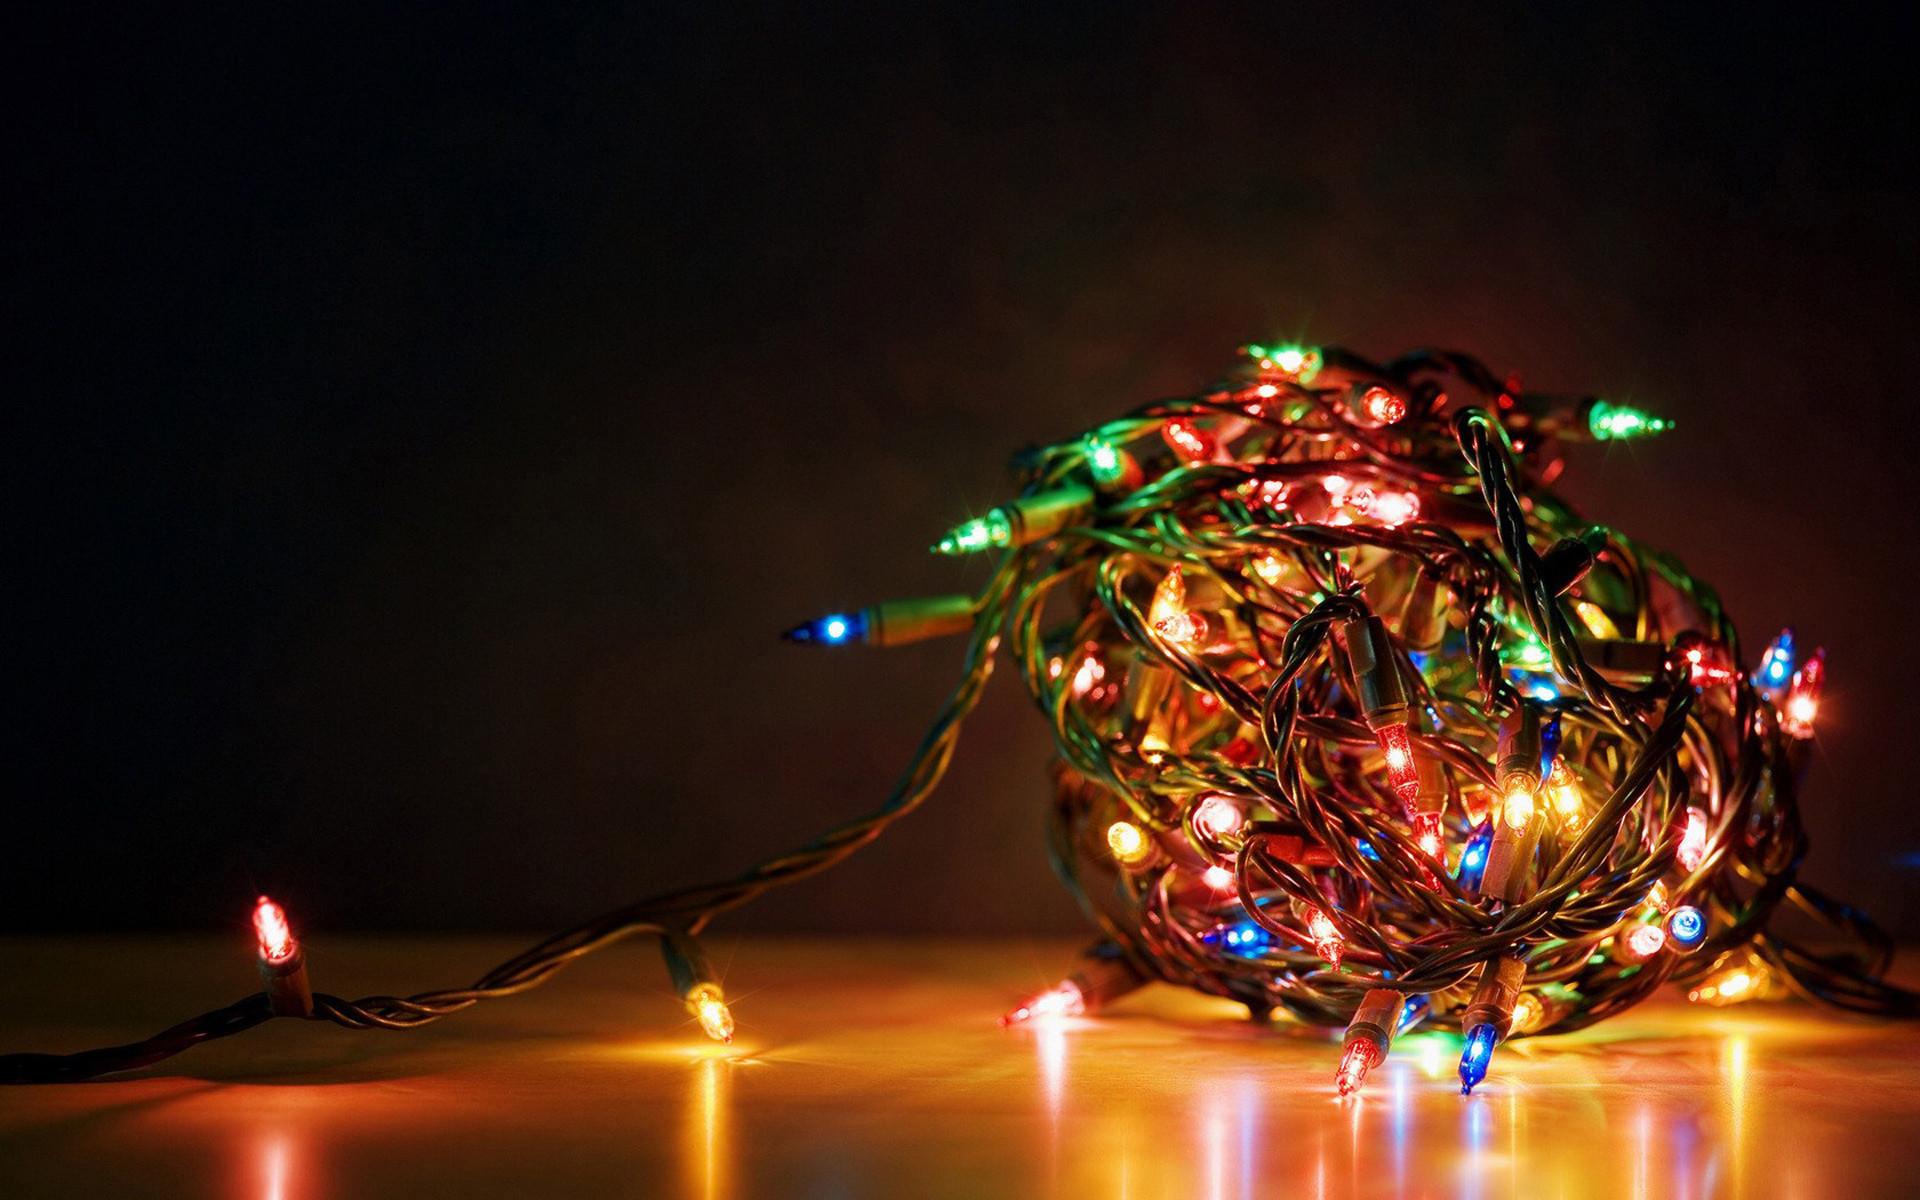 Computer Christmas Wallpaper ·①